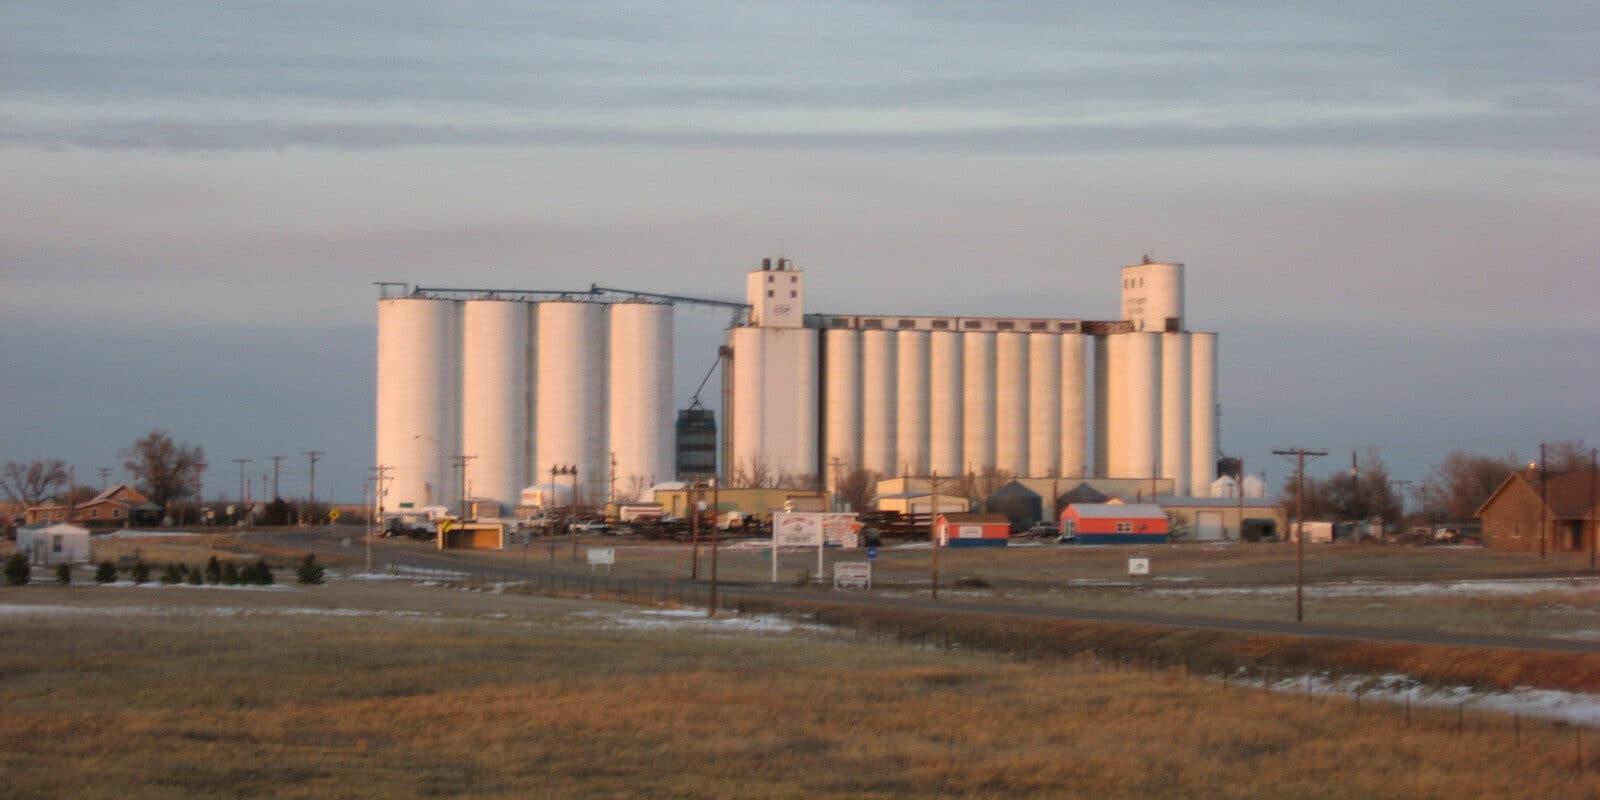 Seibert Colorado Grain Elevators